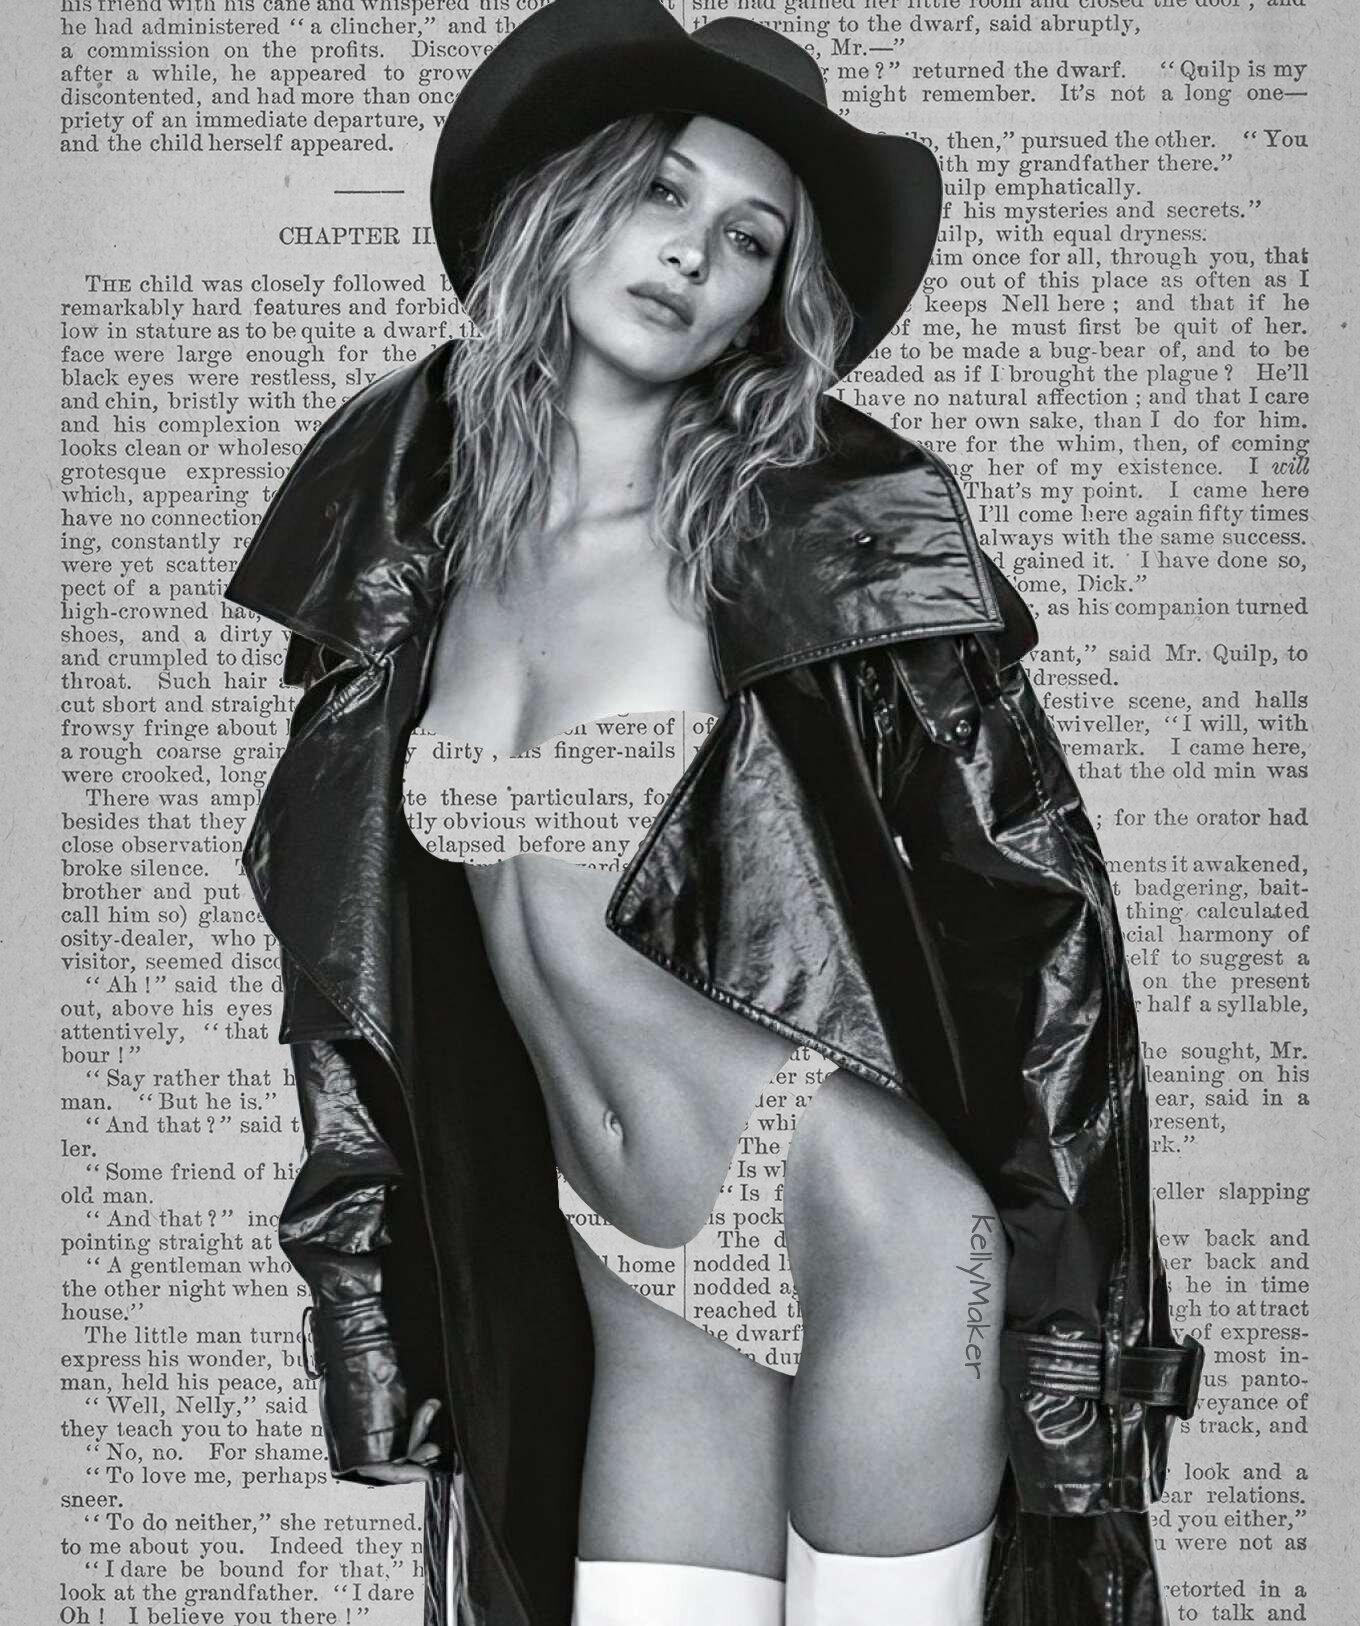 Bella+Hadid+in+western+style+by+Daniel+Jackson+for+Vogue+Australia+(2).jpg